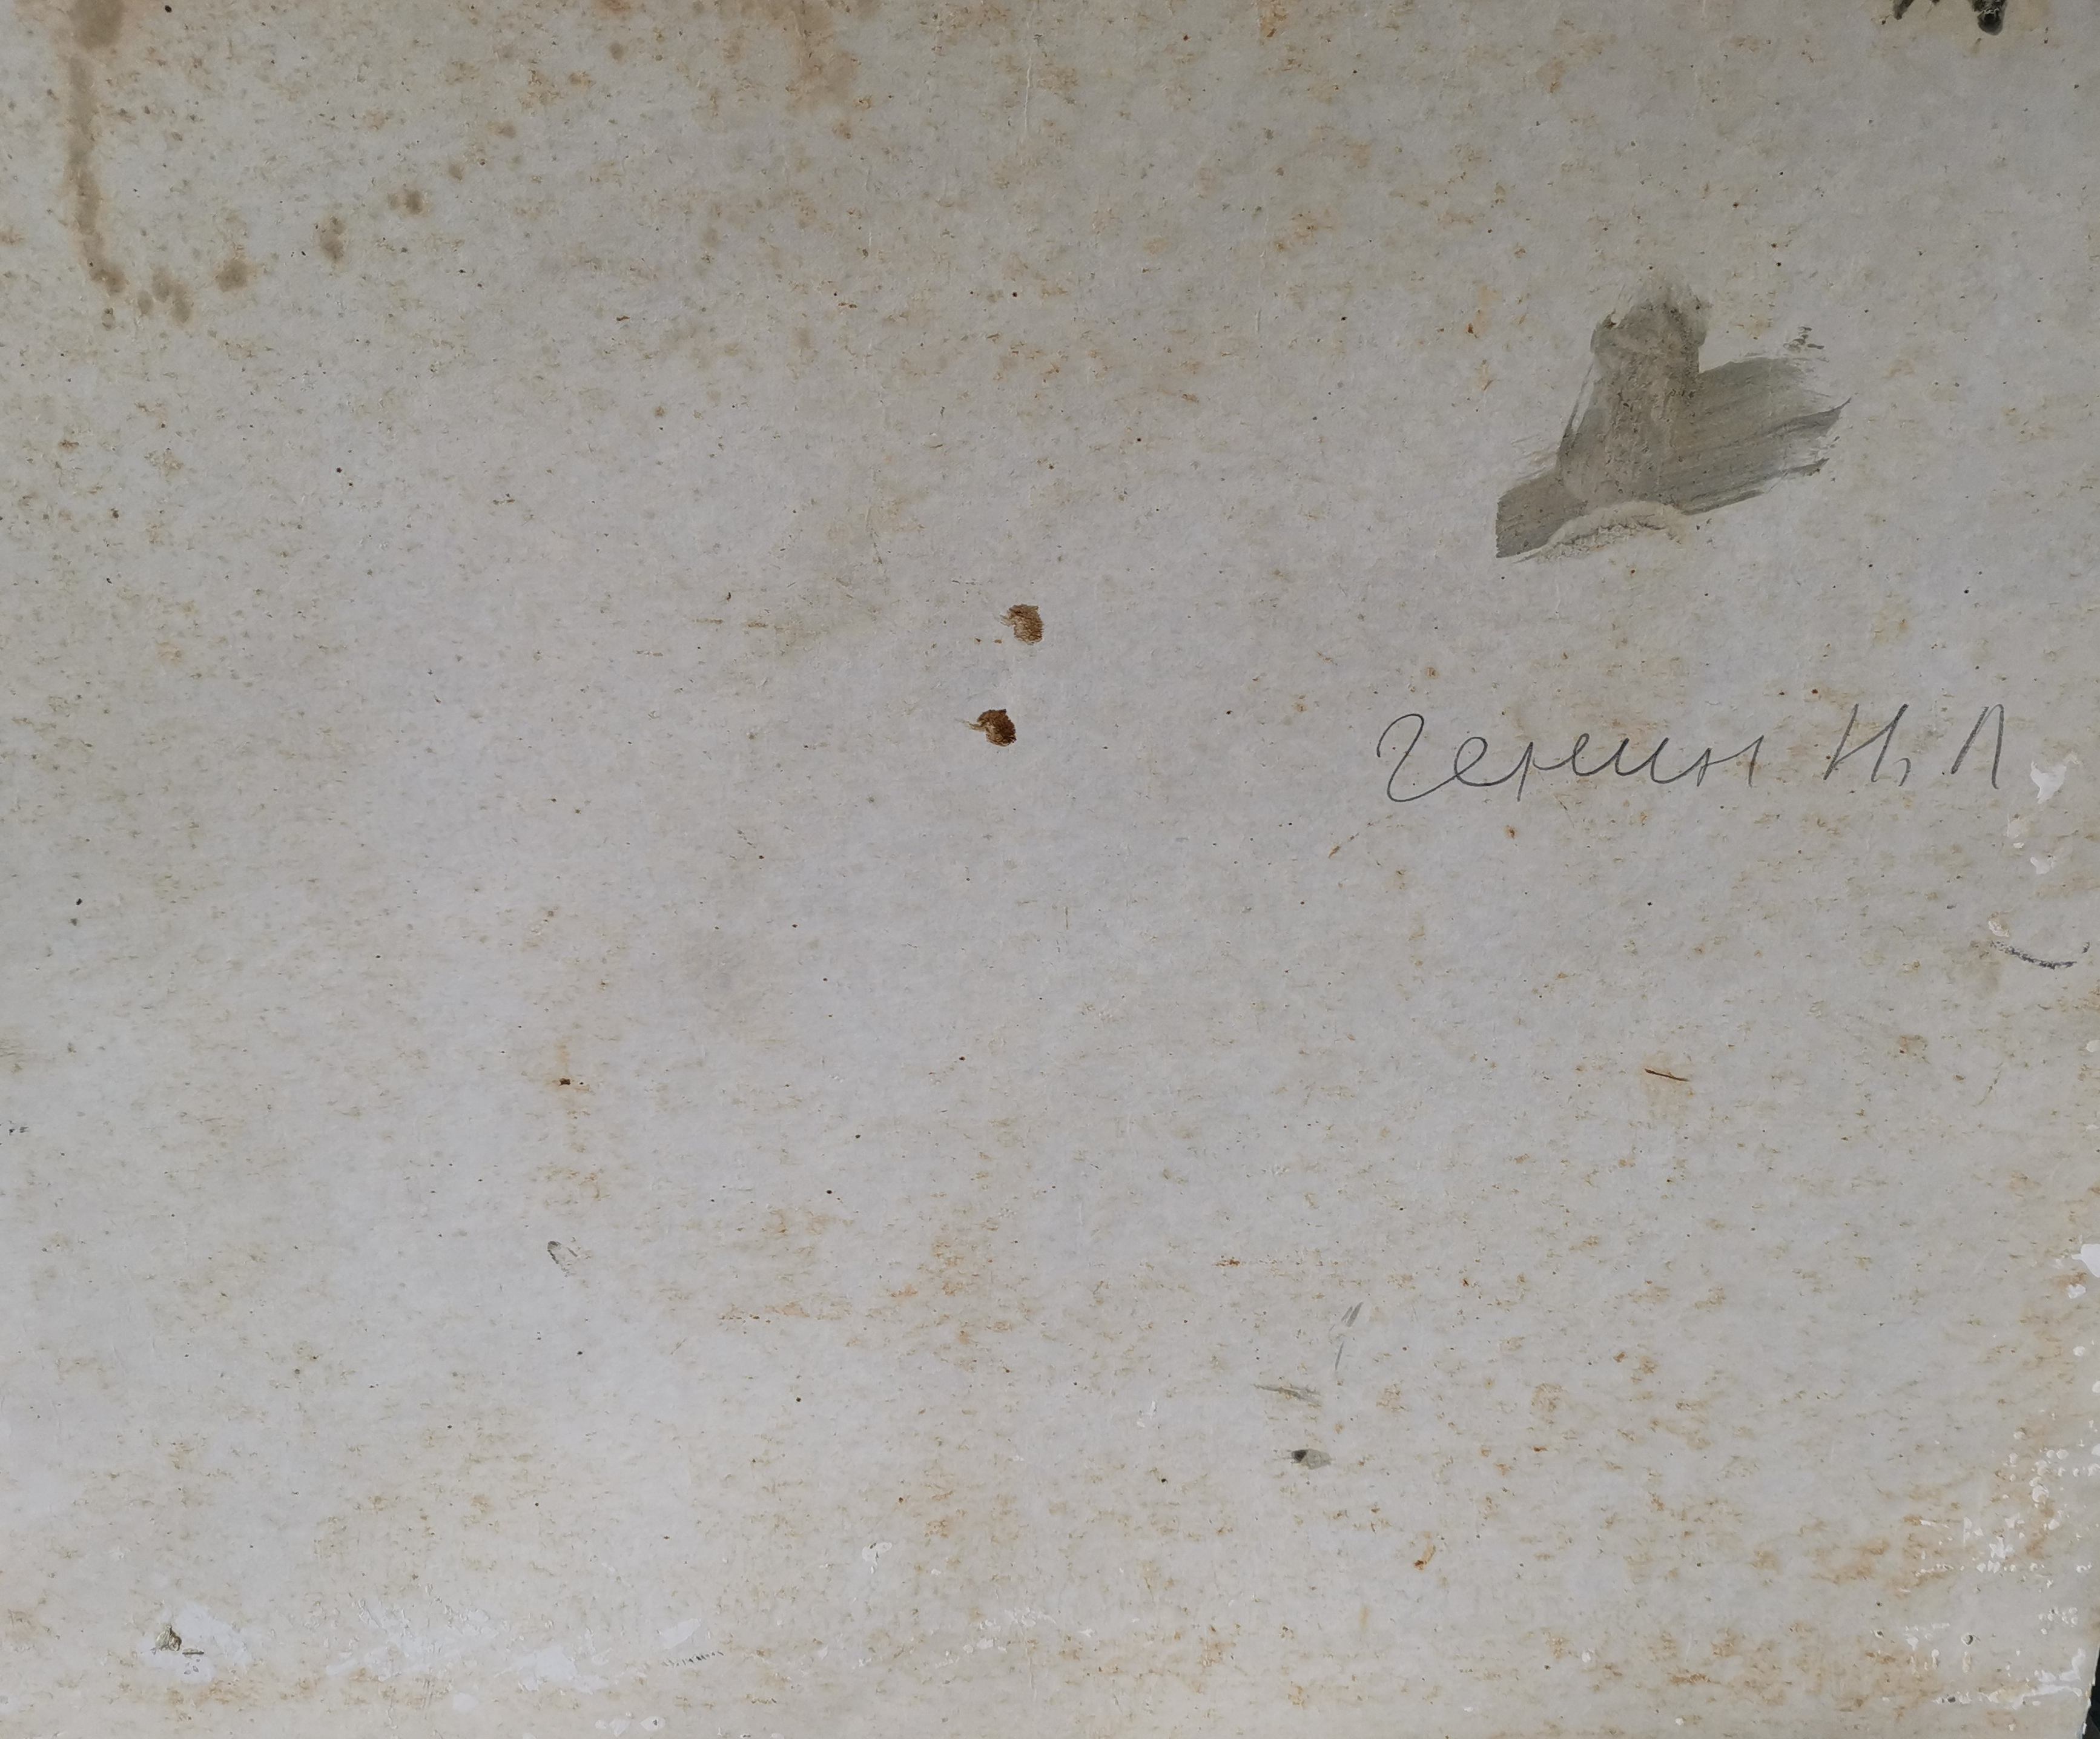 Зимний лес 60-60 см., картон, масло 1940 - 1